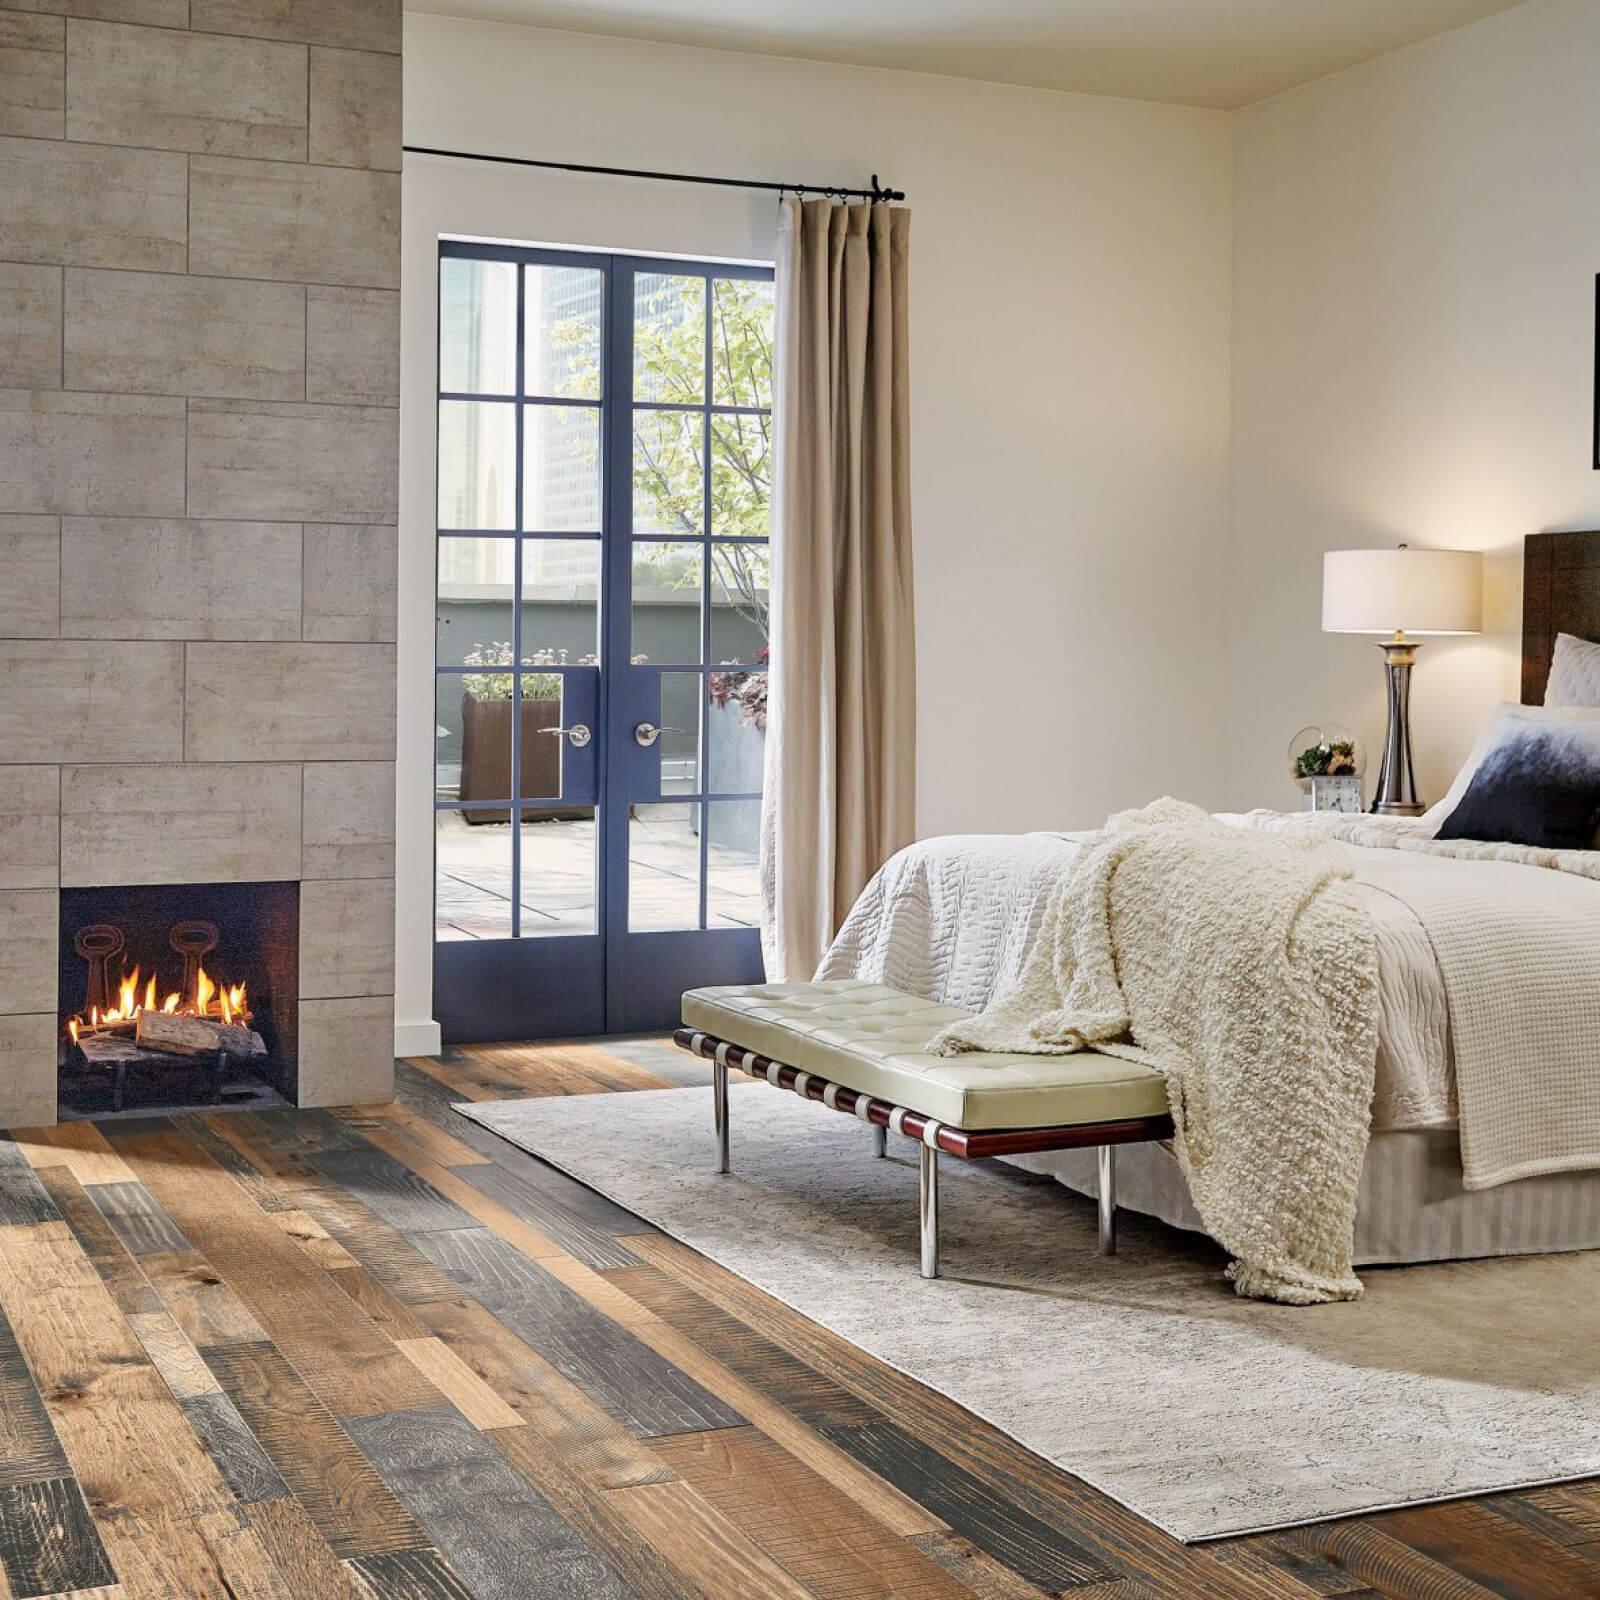 Hardwood Flooring in Bedroom | Dalton Flooring Outlet